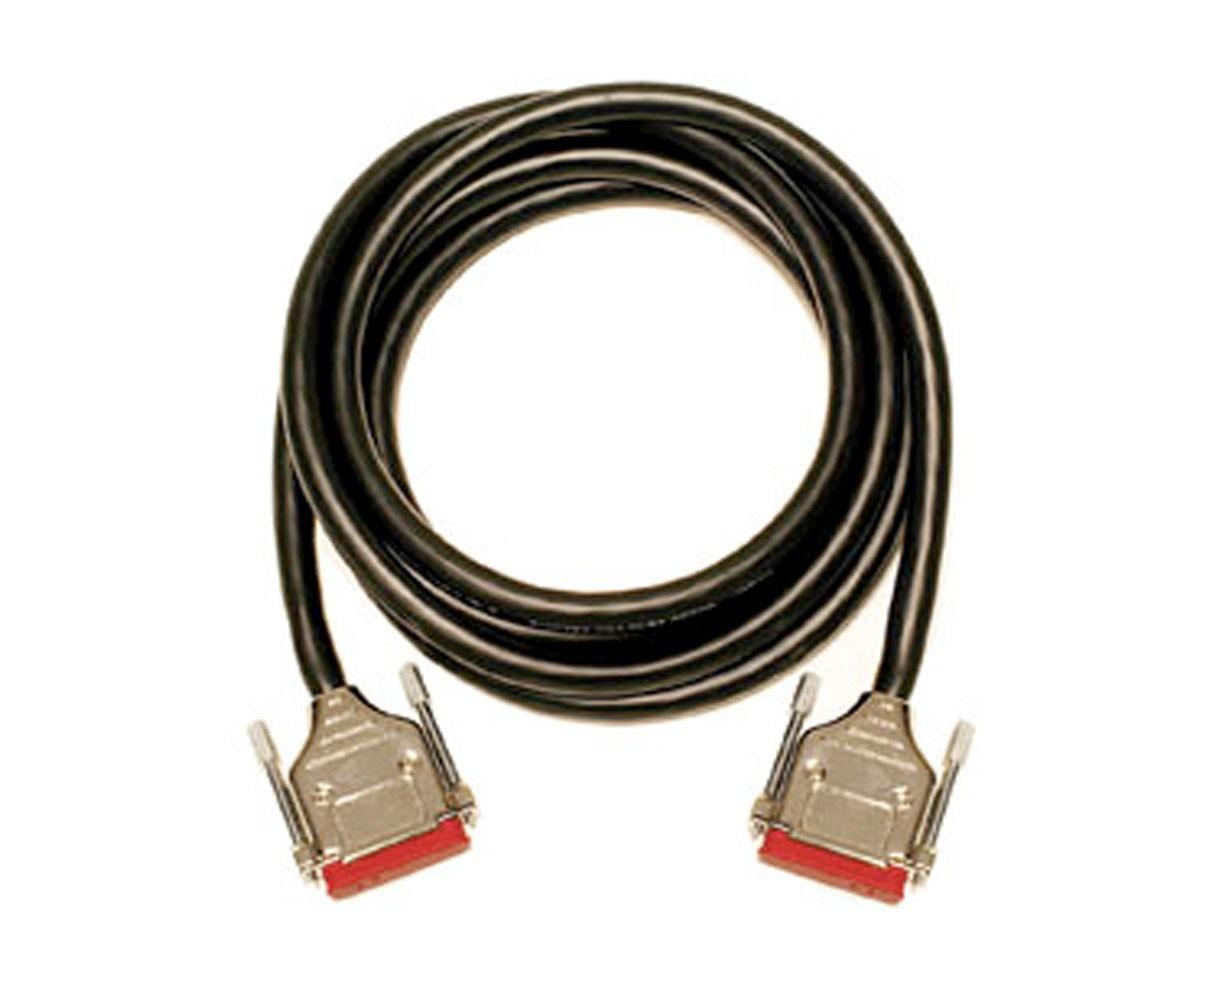 Mogami 8 Channel DB25-DB25 DSUB 10' Snake